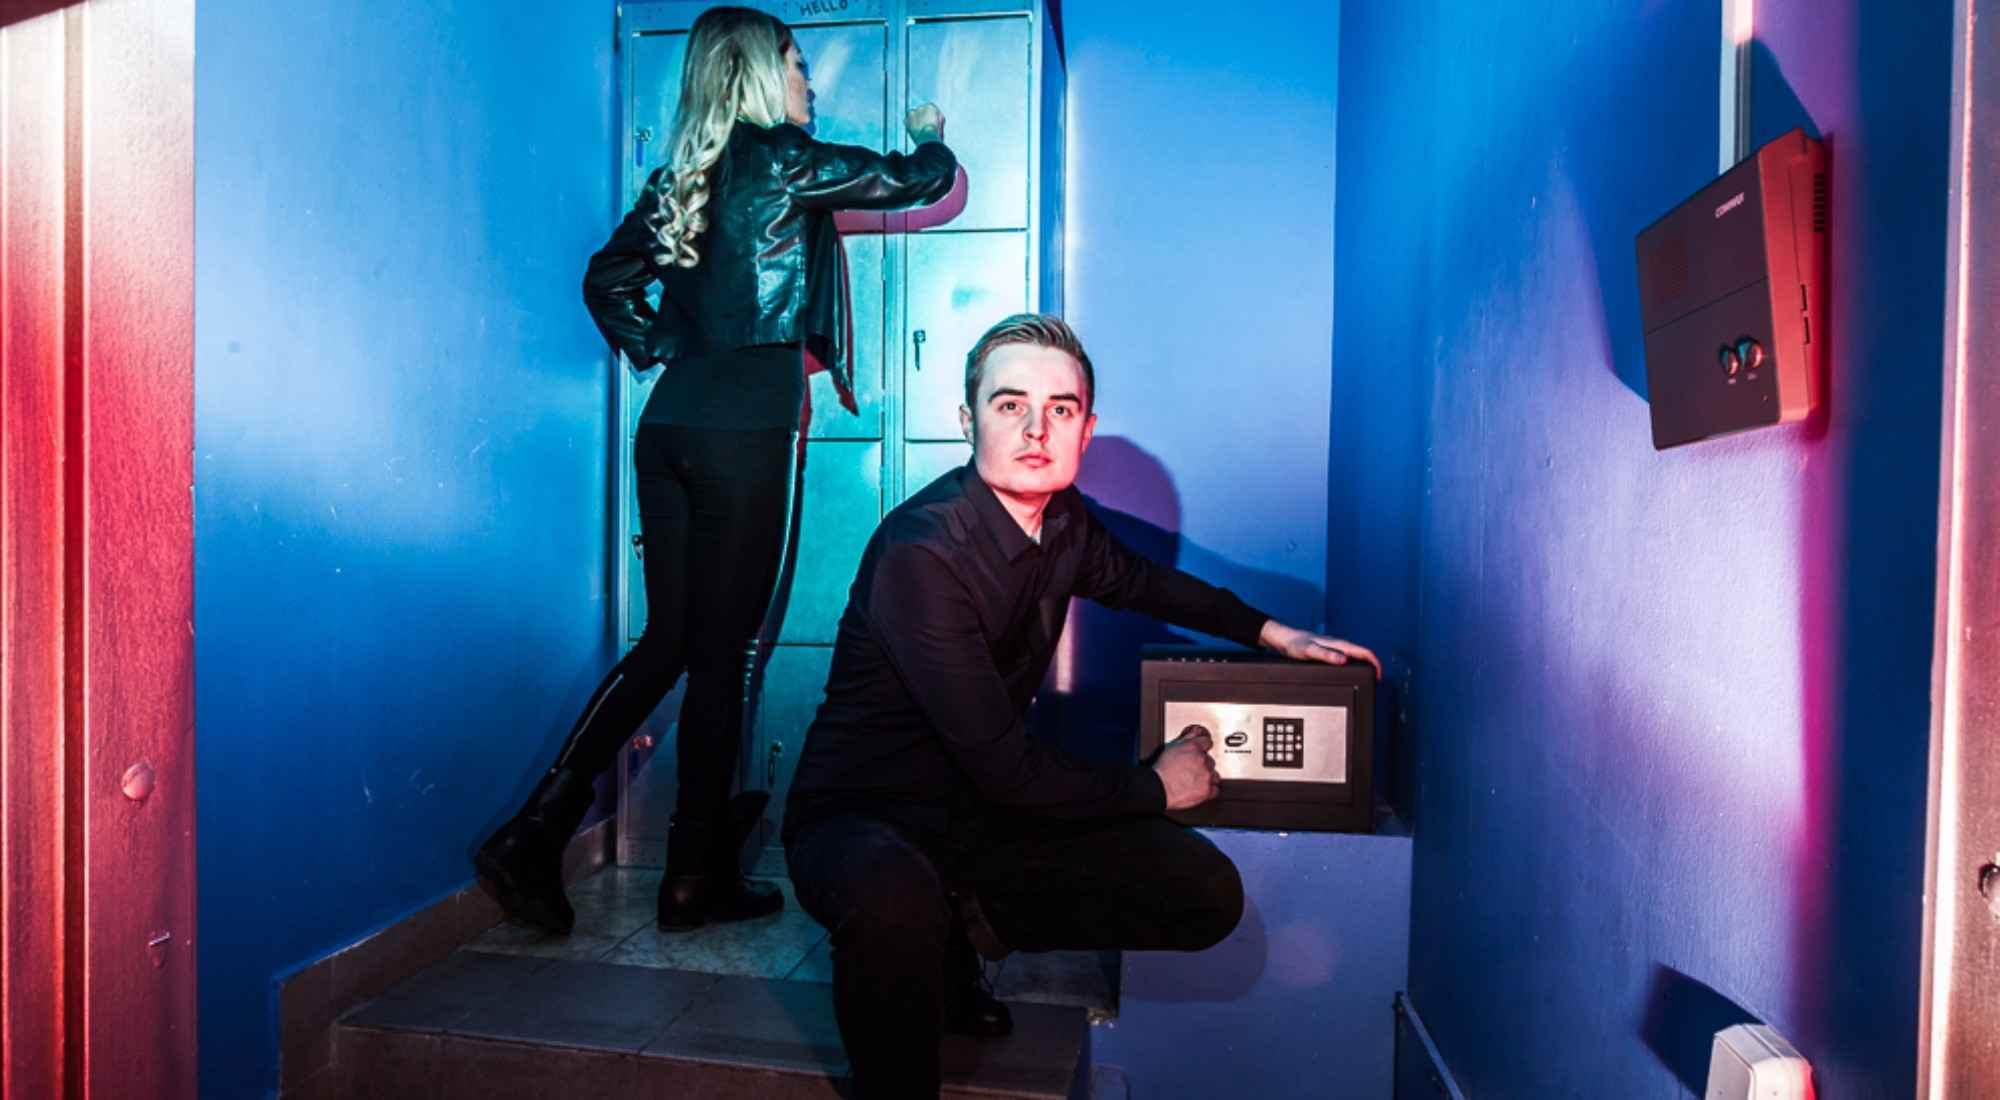 Квест в реальности Хранилище Funlock Москва